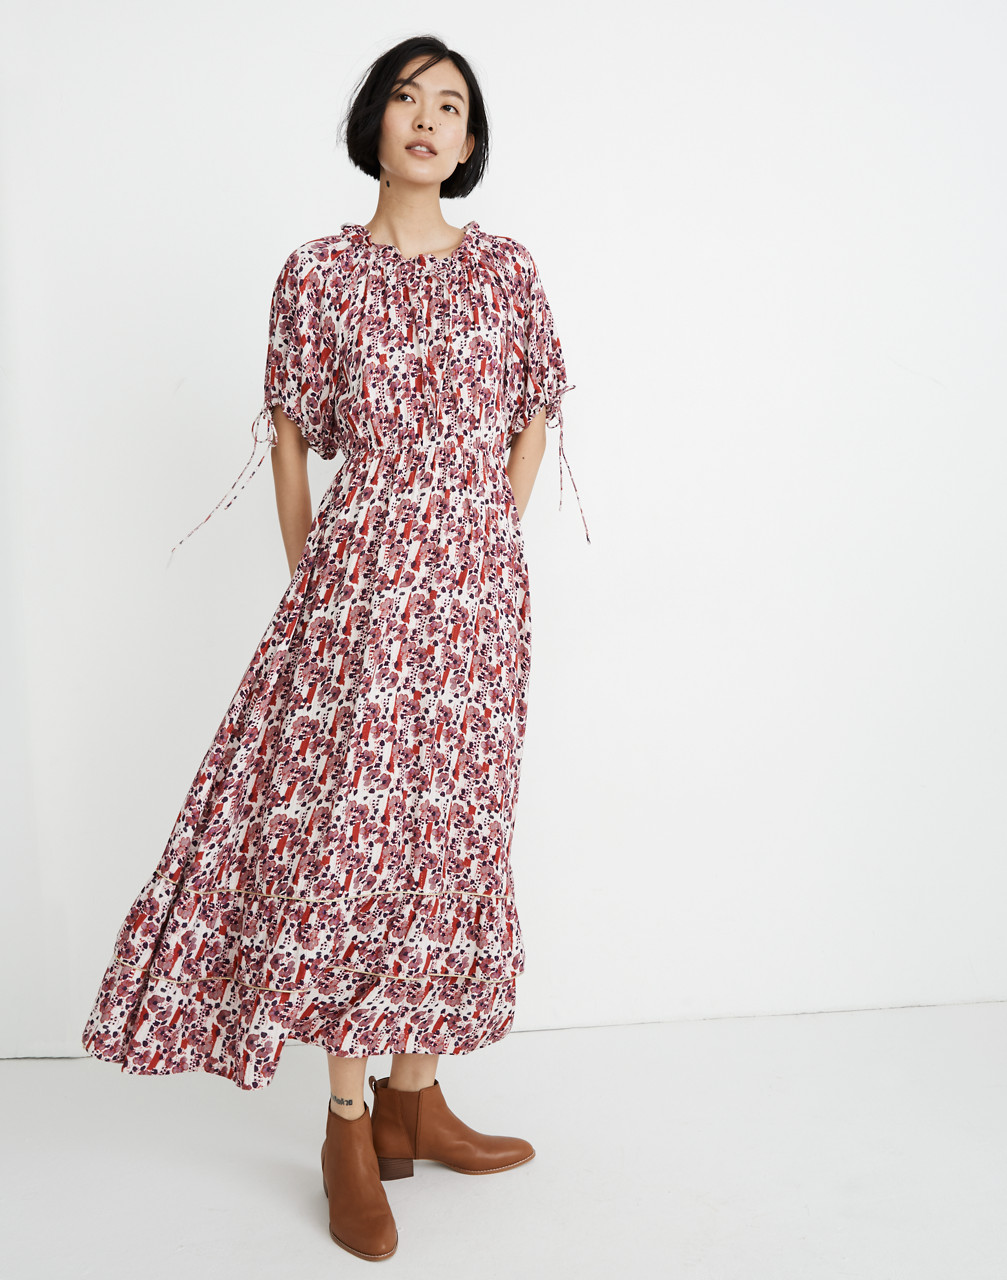 1980s Clothing, Fashion | 80s Style Clothes Warm Geranium Maxi Dress $199.99 AT vintagedancer.com